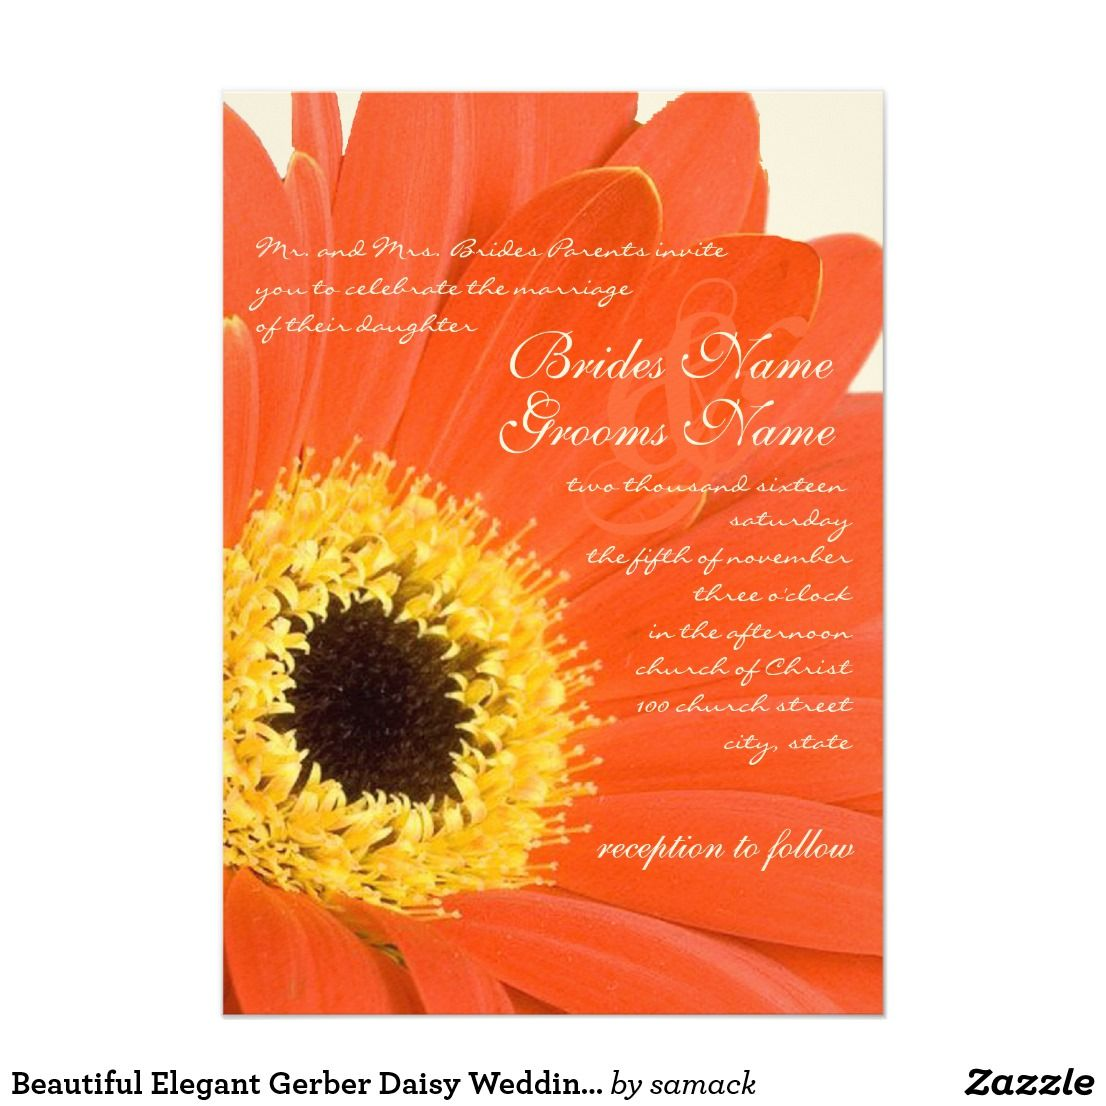 Beautiful Elegant Gerber Daisy Wedding Invitation | Knot | Pinterest ...